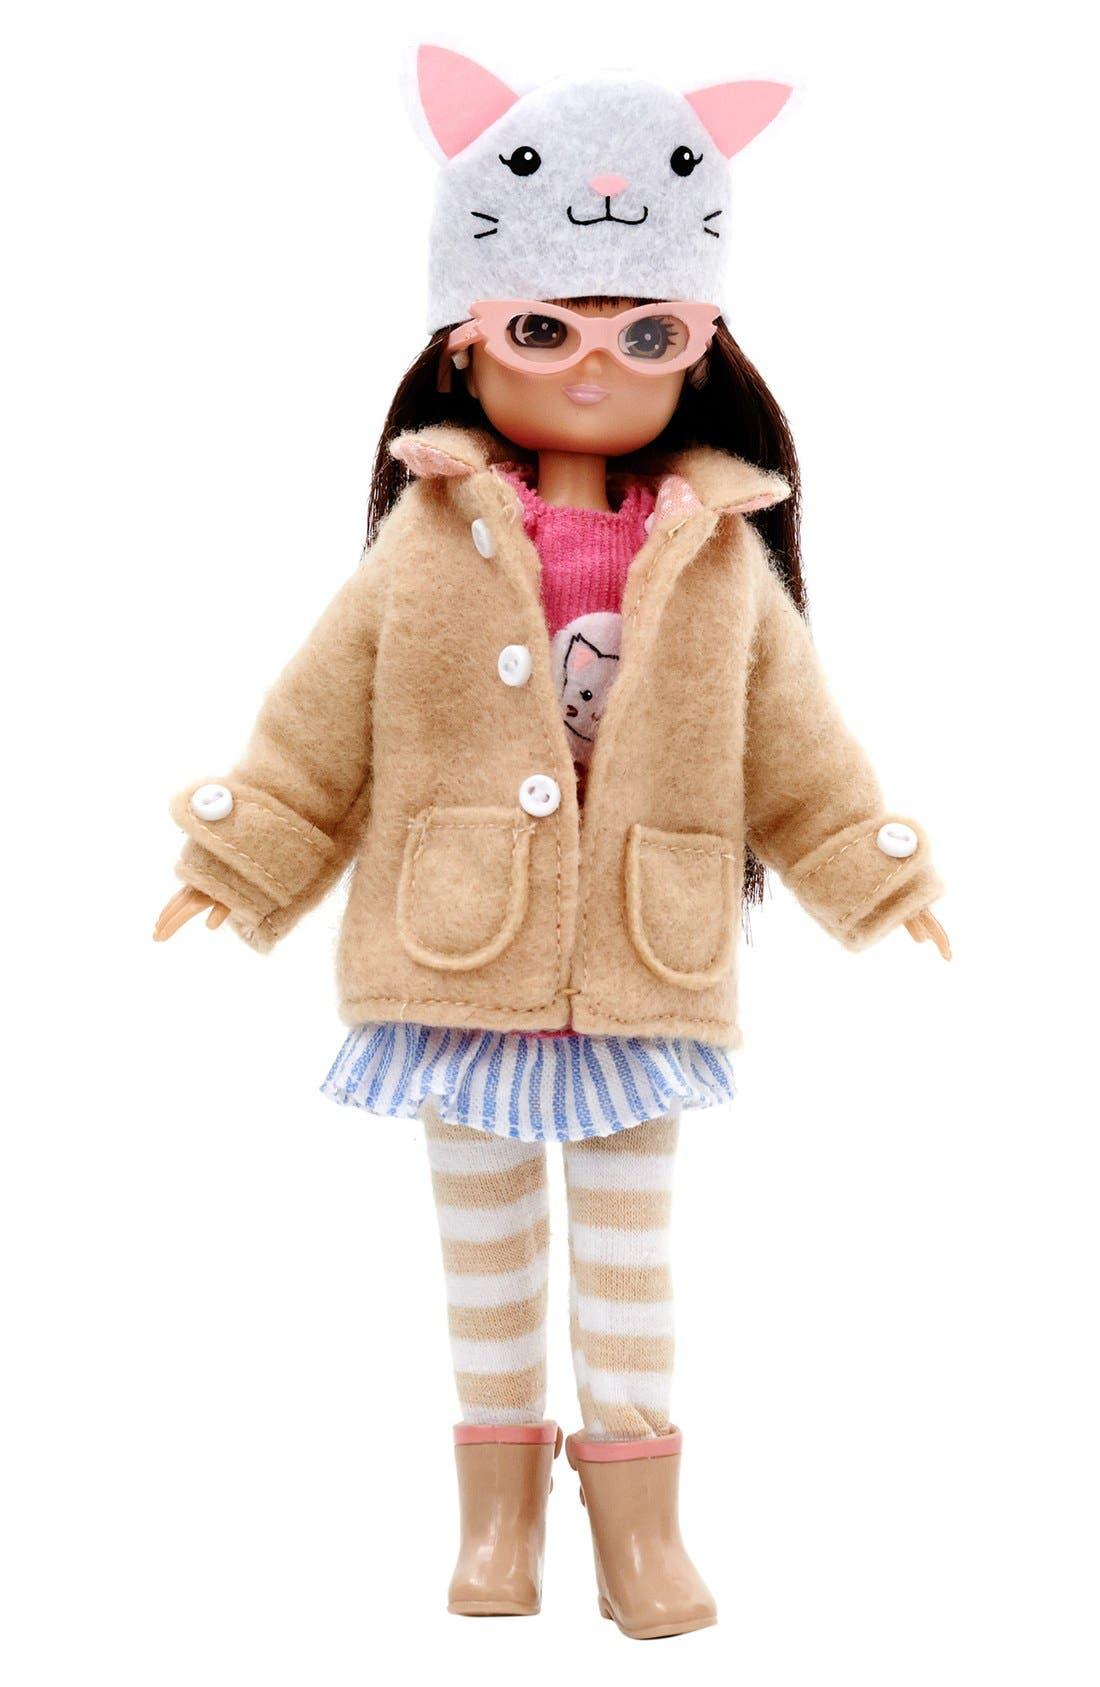 Alternate Image 1 Selected - Schylling 'Lottie™ - Pandora's Box' Doll